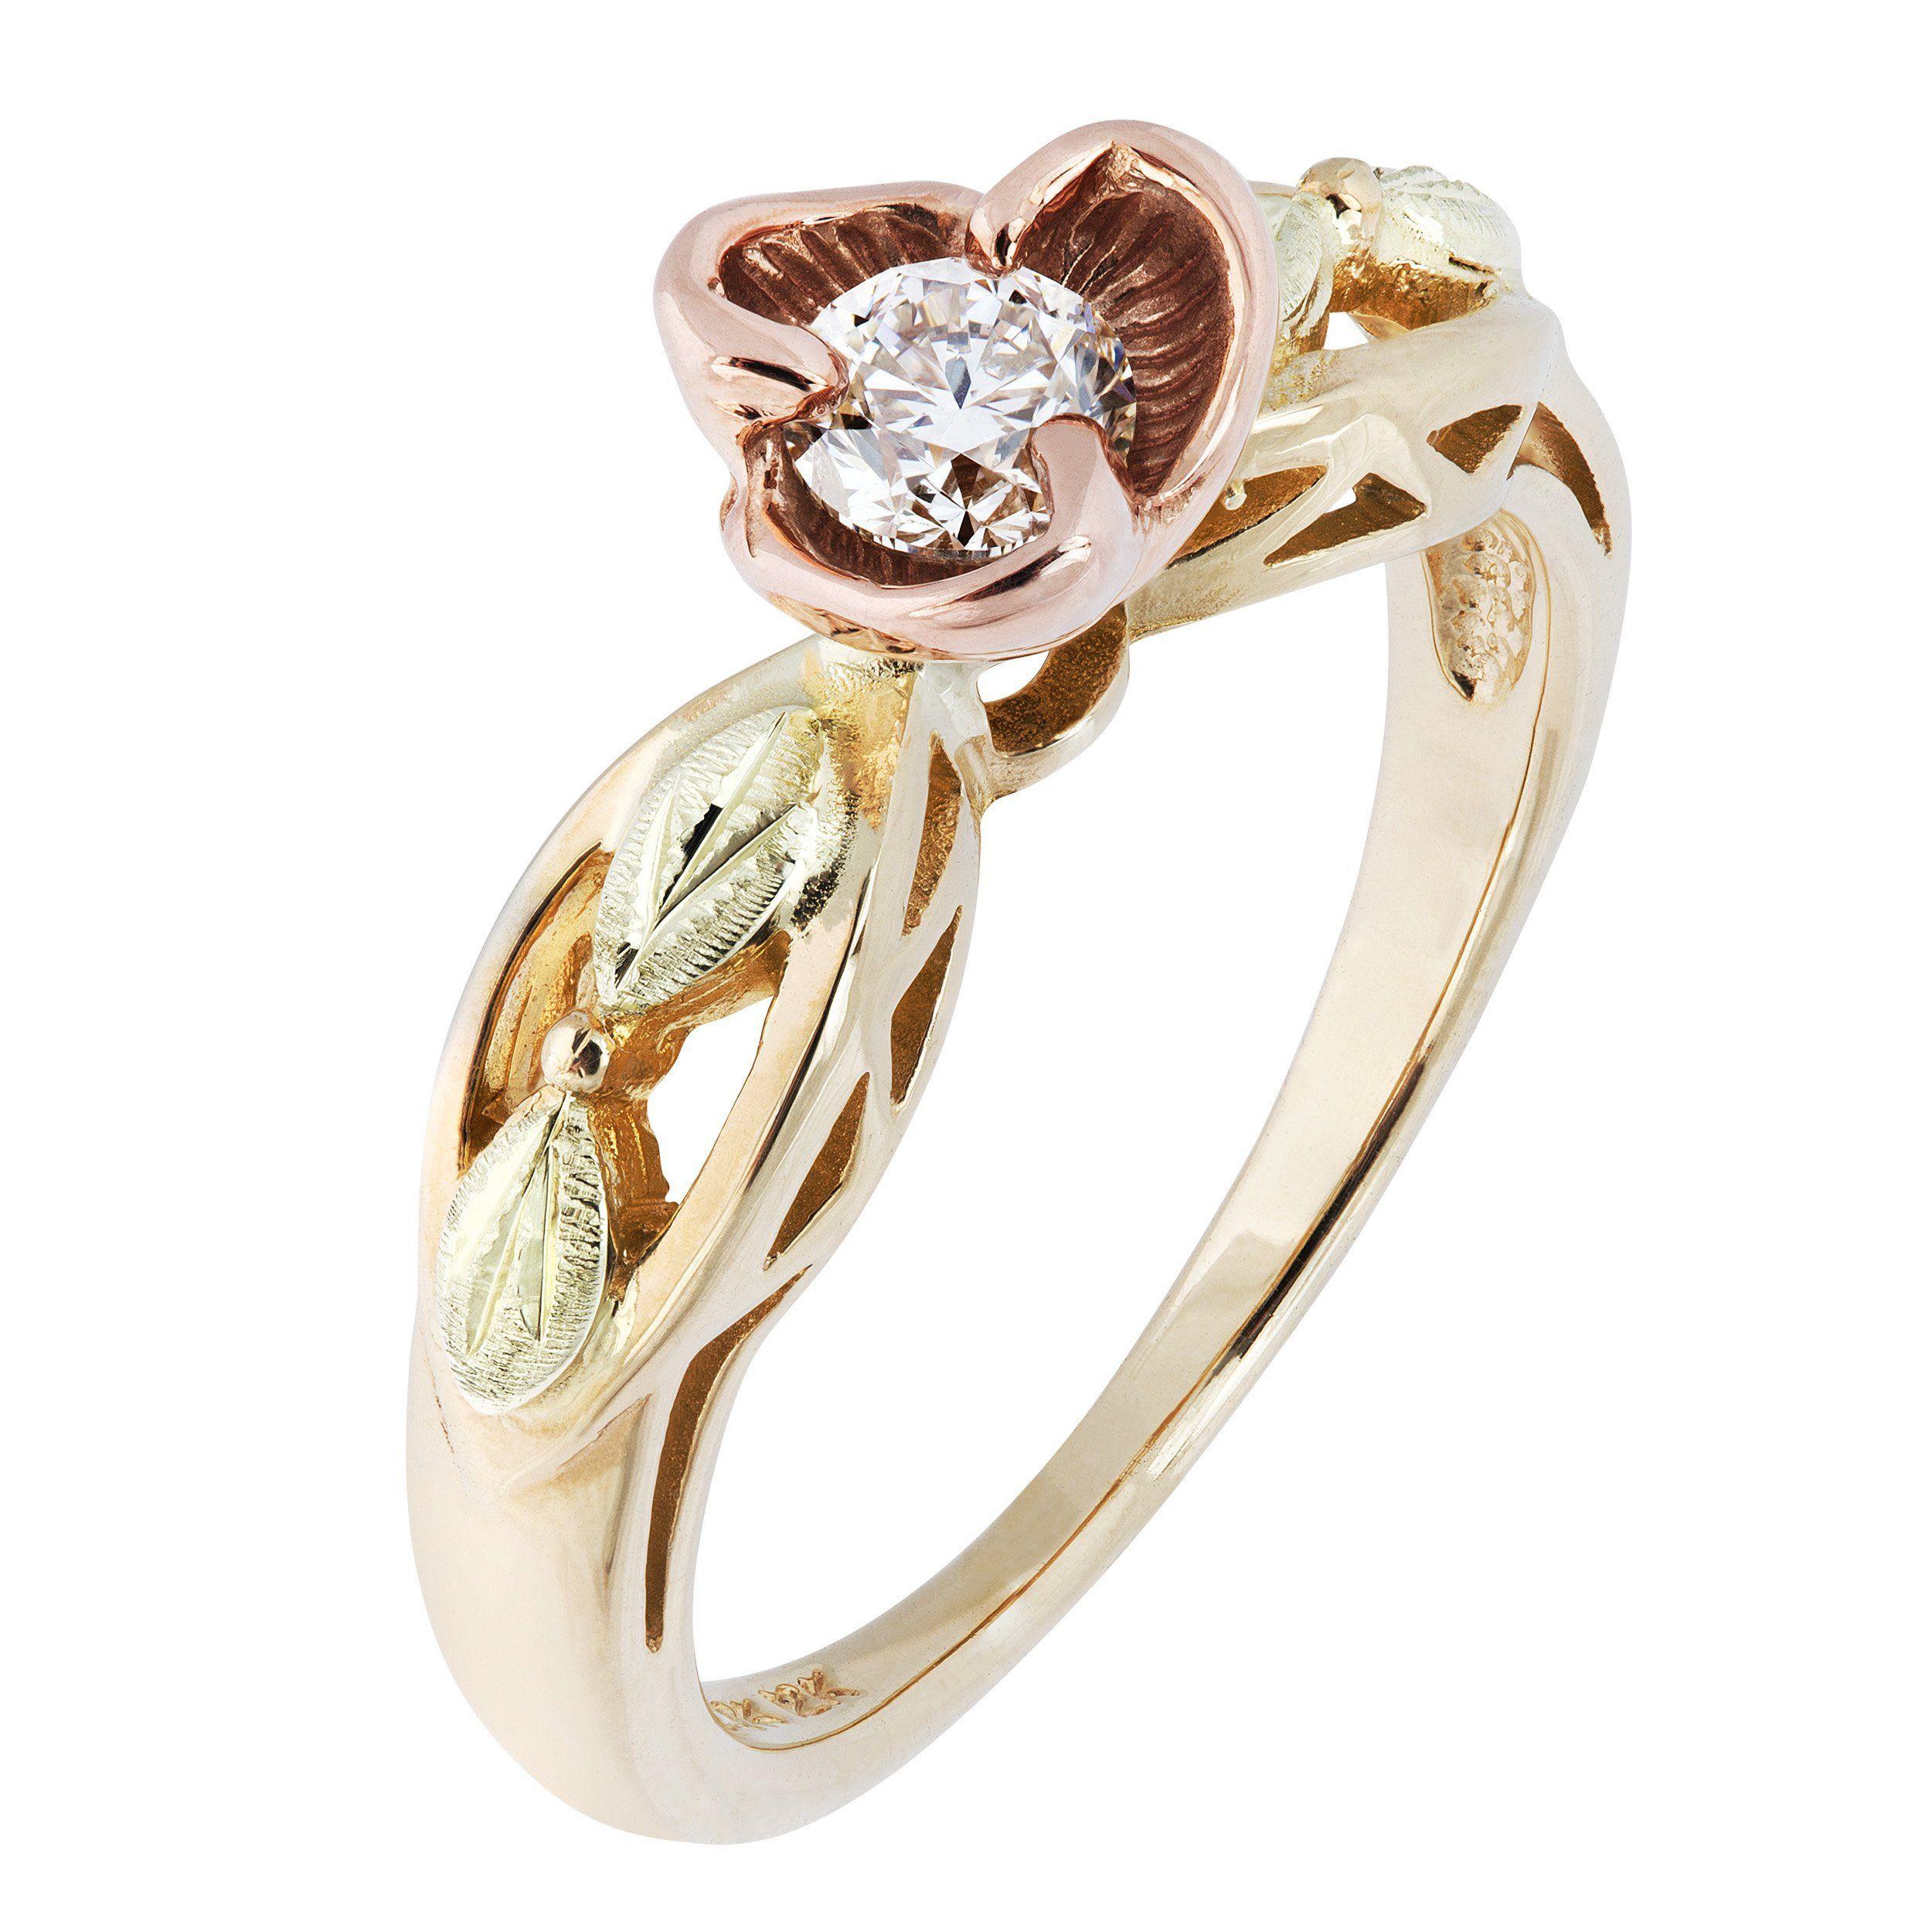 Flowering Diamond Black Hills Gold Engagement Ring Black Hills Gold Jewelry Black Hills Gold Wedding Rings Black Hills Gold